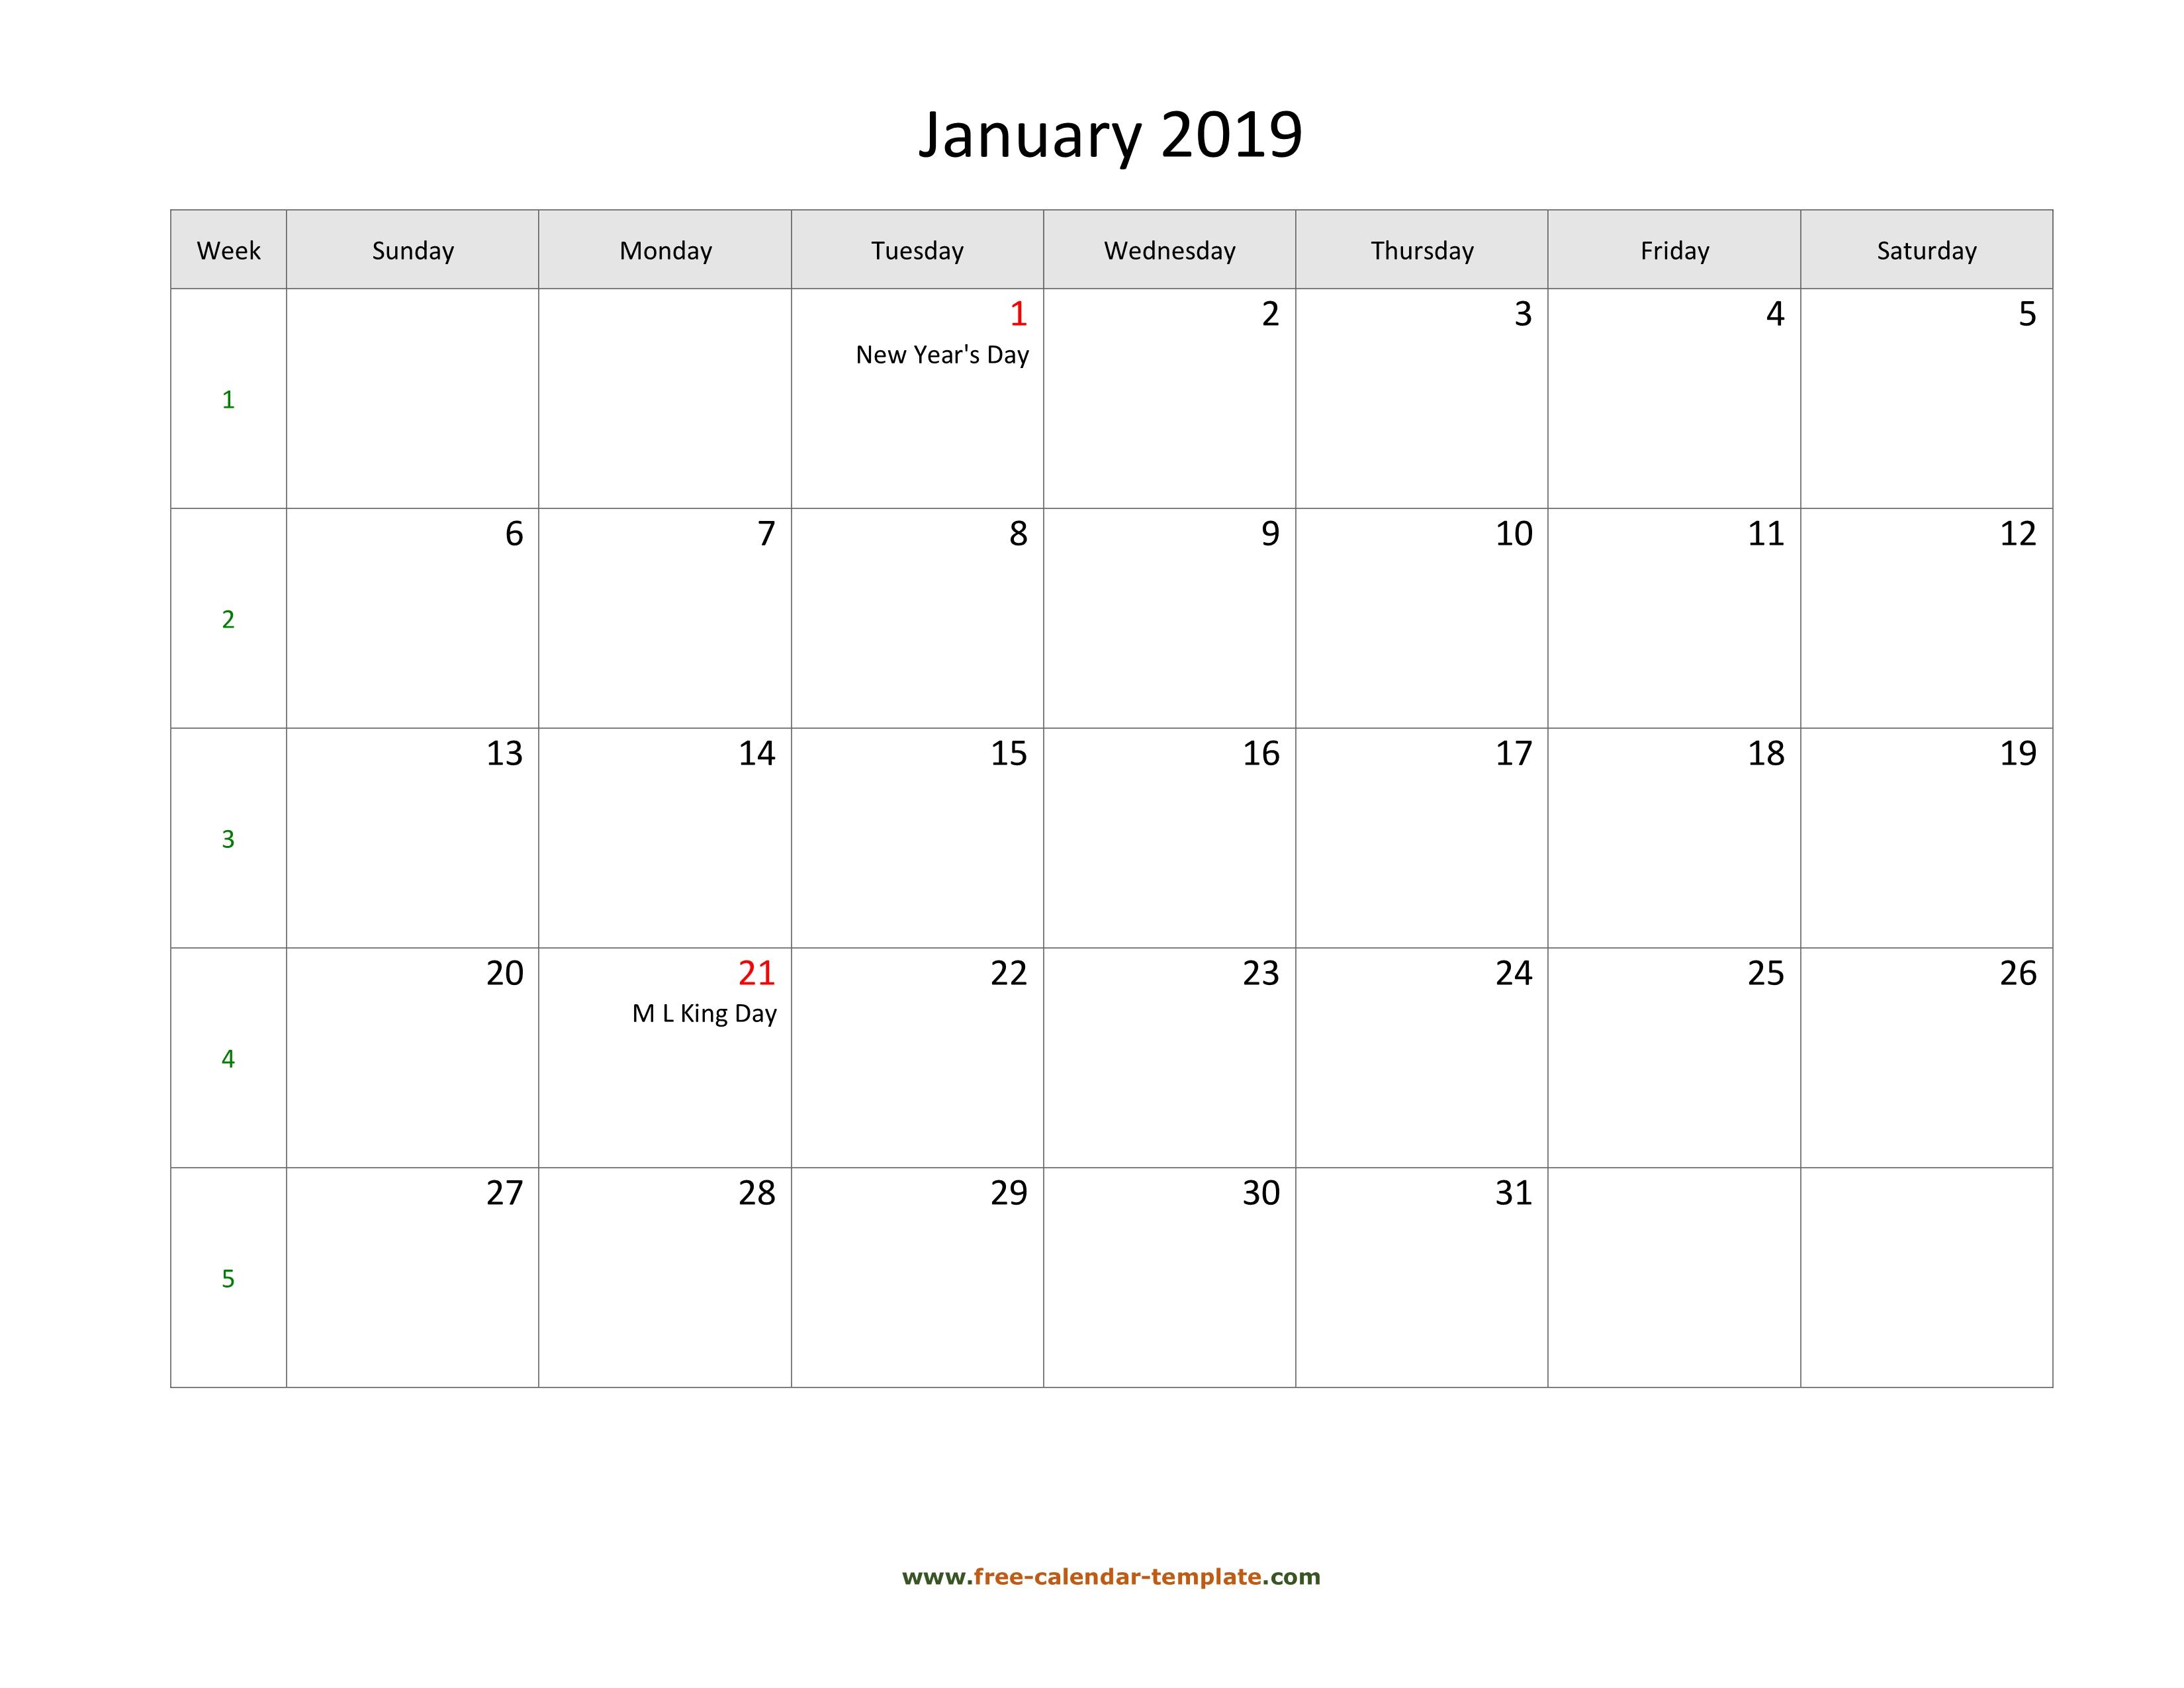 Free 2019 Calendar Blank Monthly Template (Horizontal)